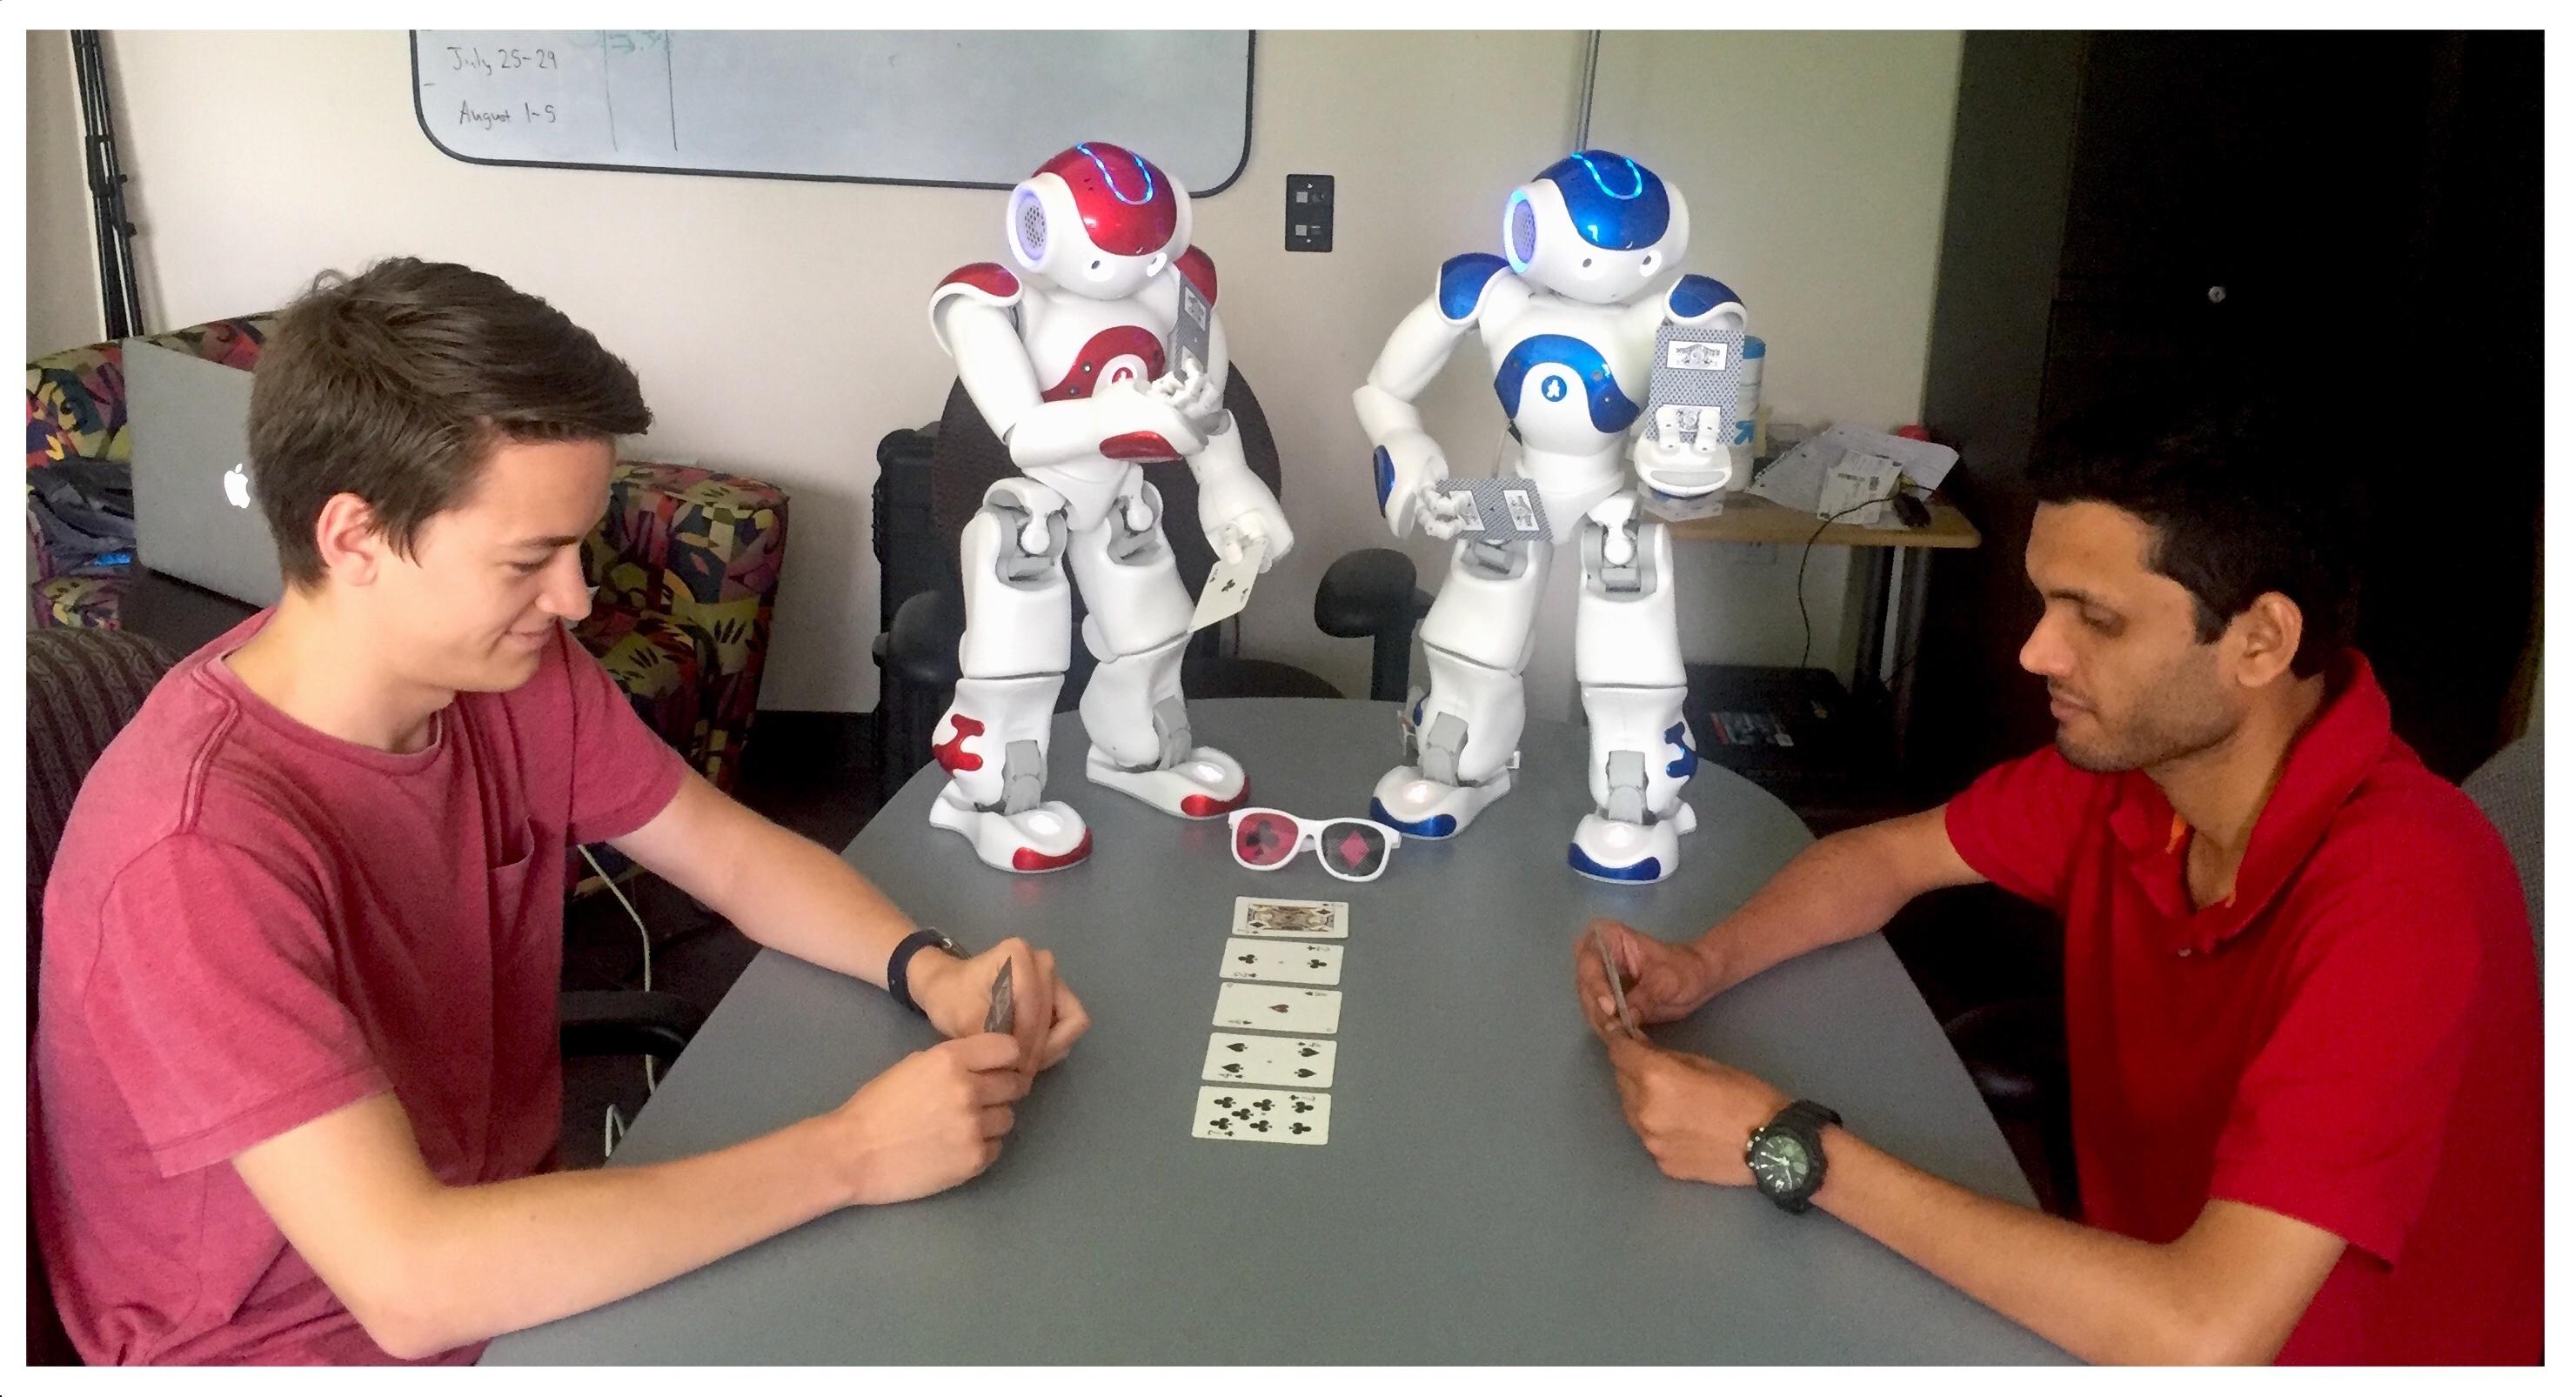 ibm-watson-poker-robots